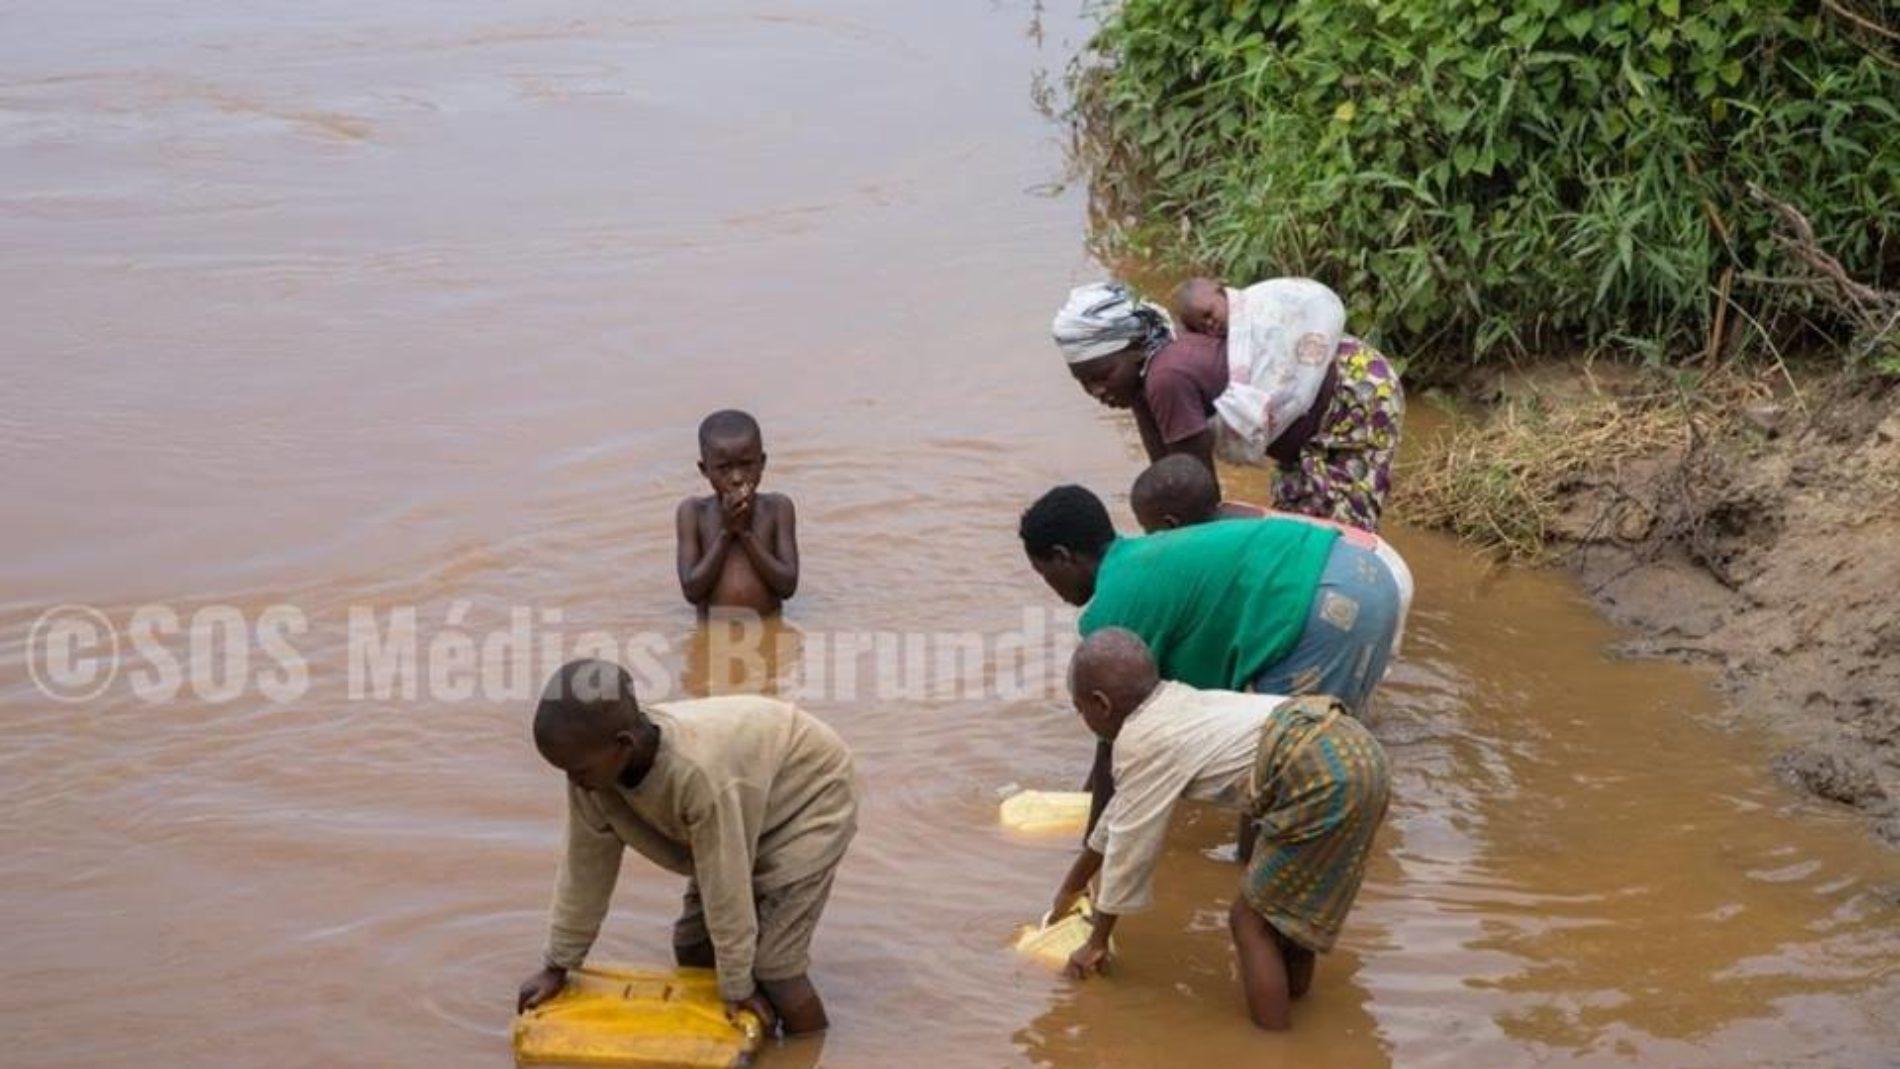 Rumonge: fear of cholera cholera following the lack of drinking water